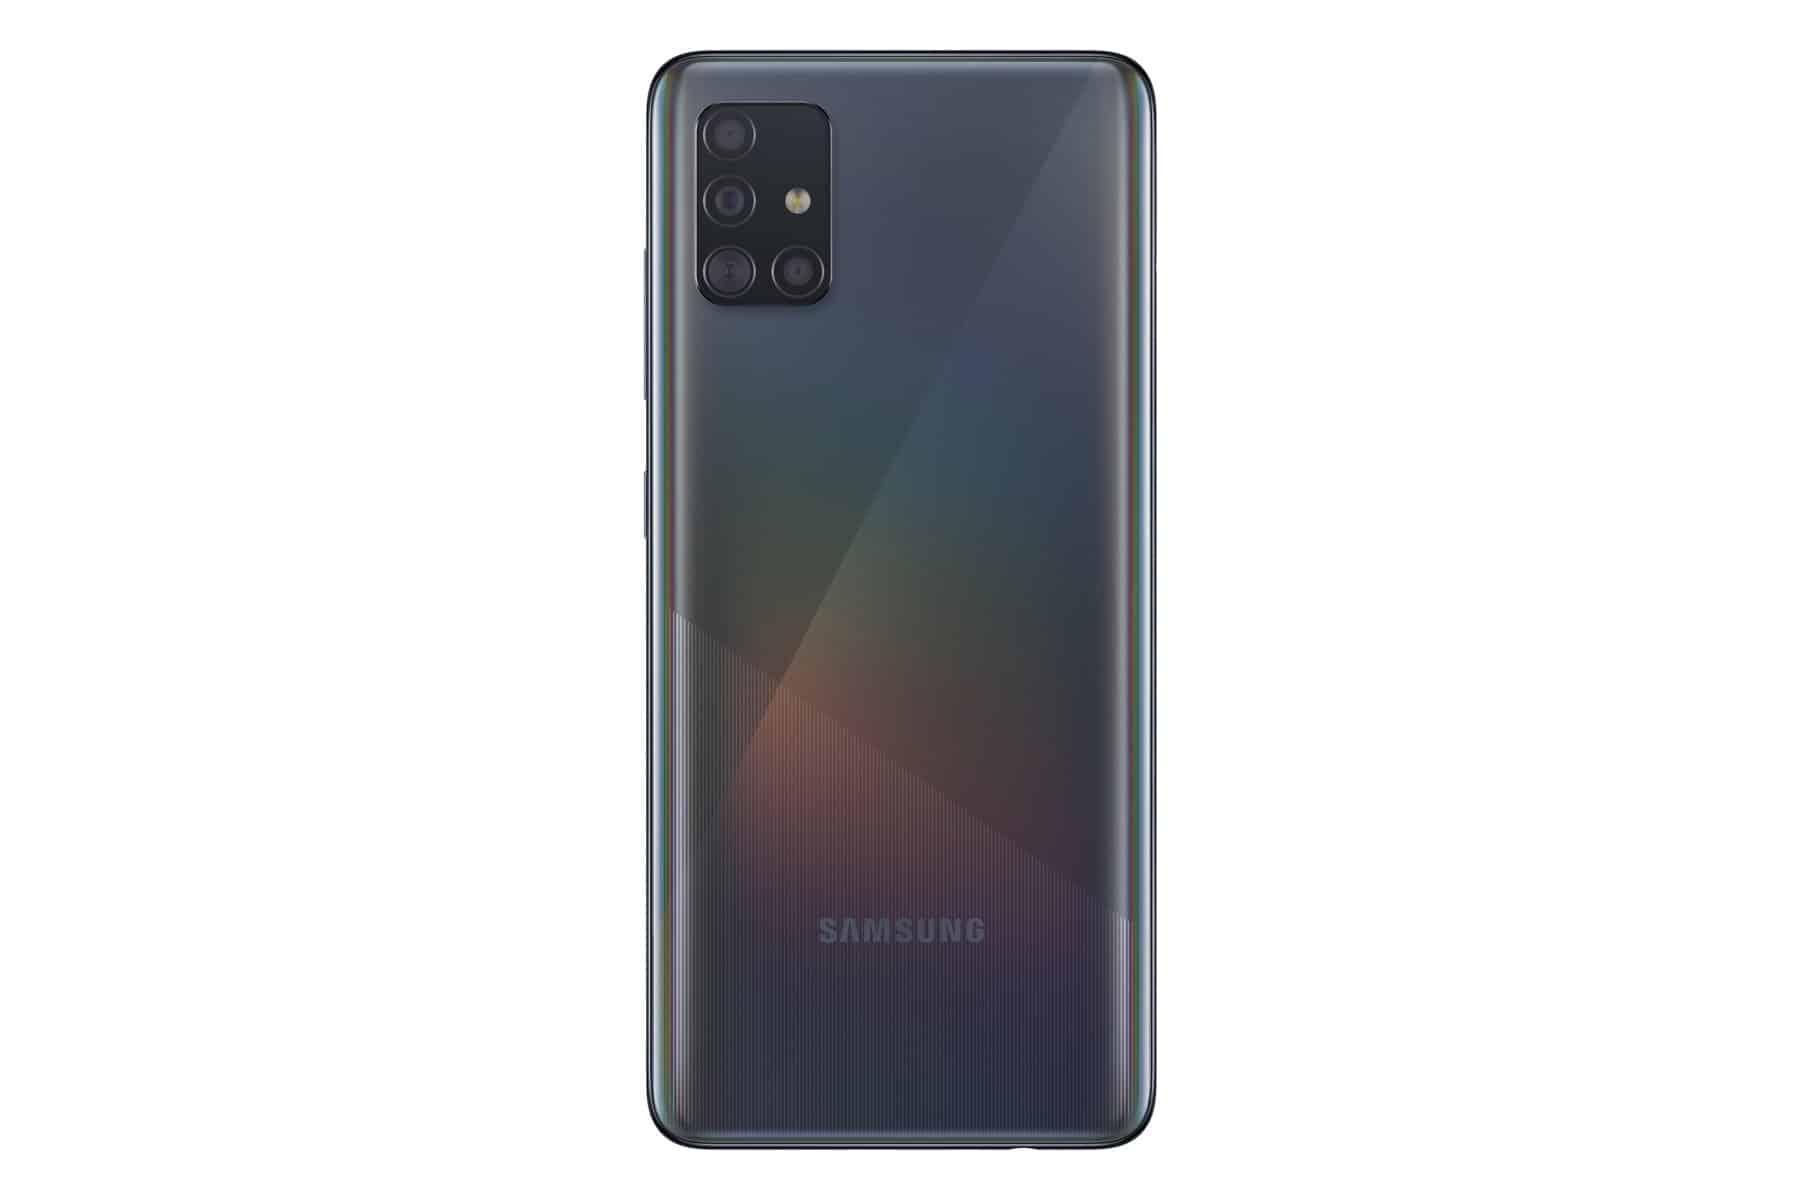 Galaxy A51 image 16